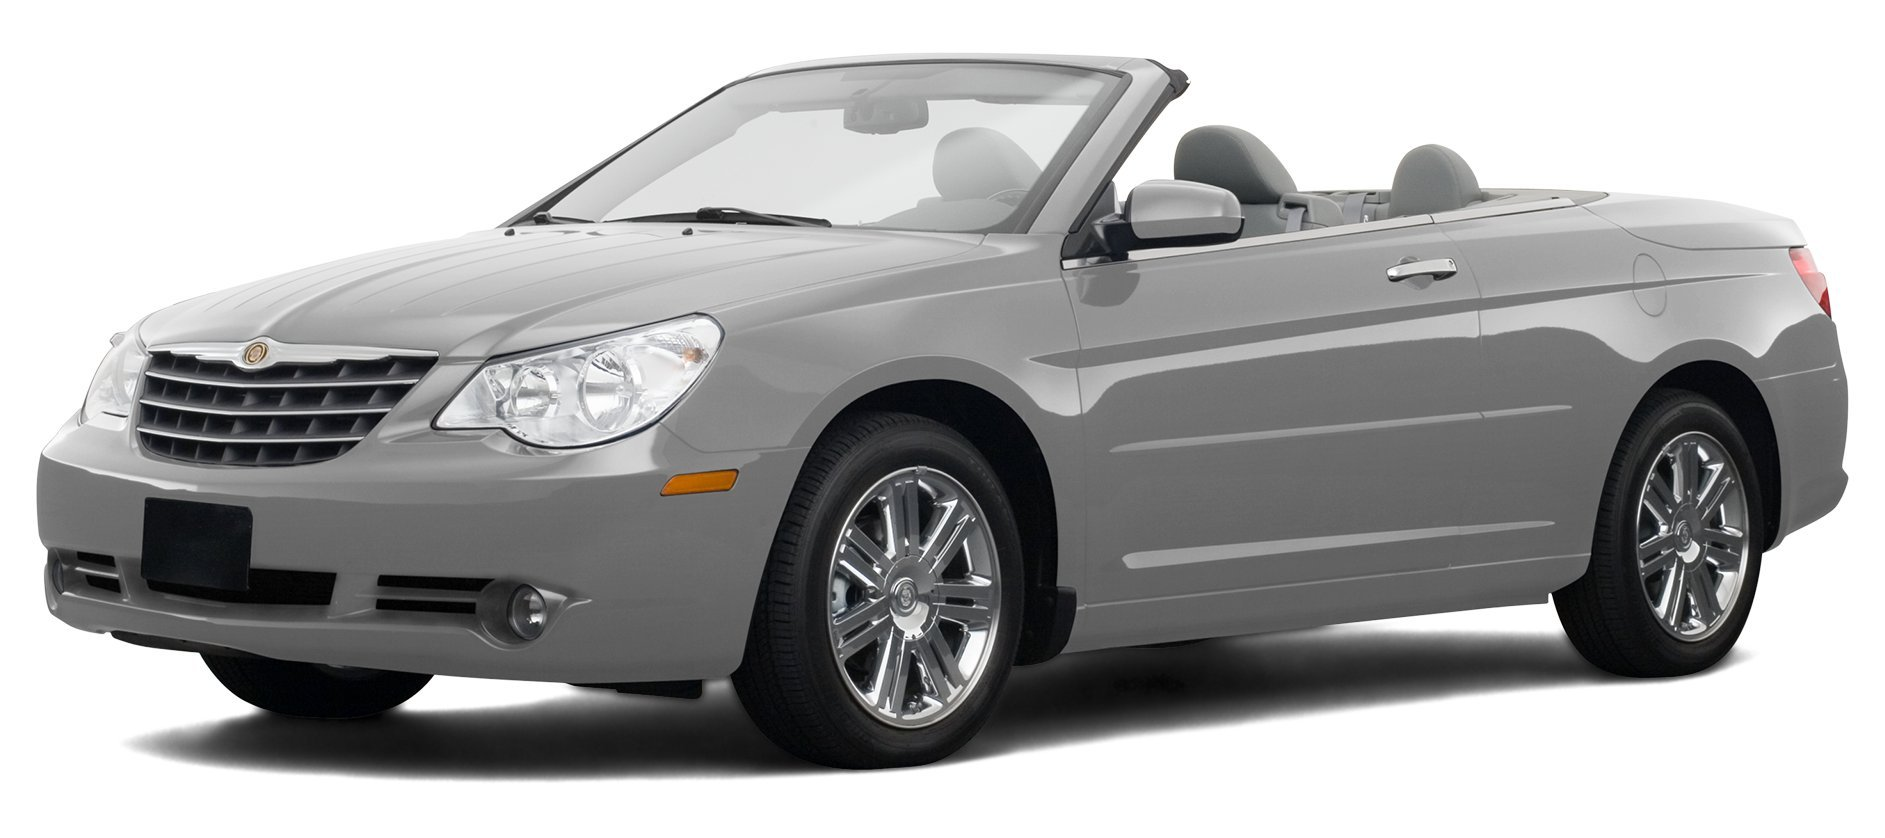 Amazon 2008 Toyota Solara Reviews S And Specs Vehicles. 2008 Chrysler Sebring Lx 2door Convertible Front Wheel Drive. Chrysler. 2008 Chrysler Sebring Parts Diagram Rear Subframe At Scoala.co